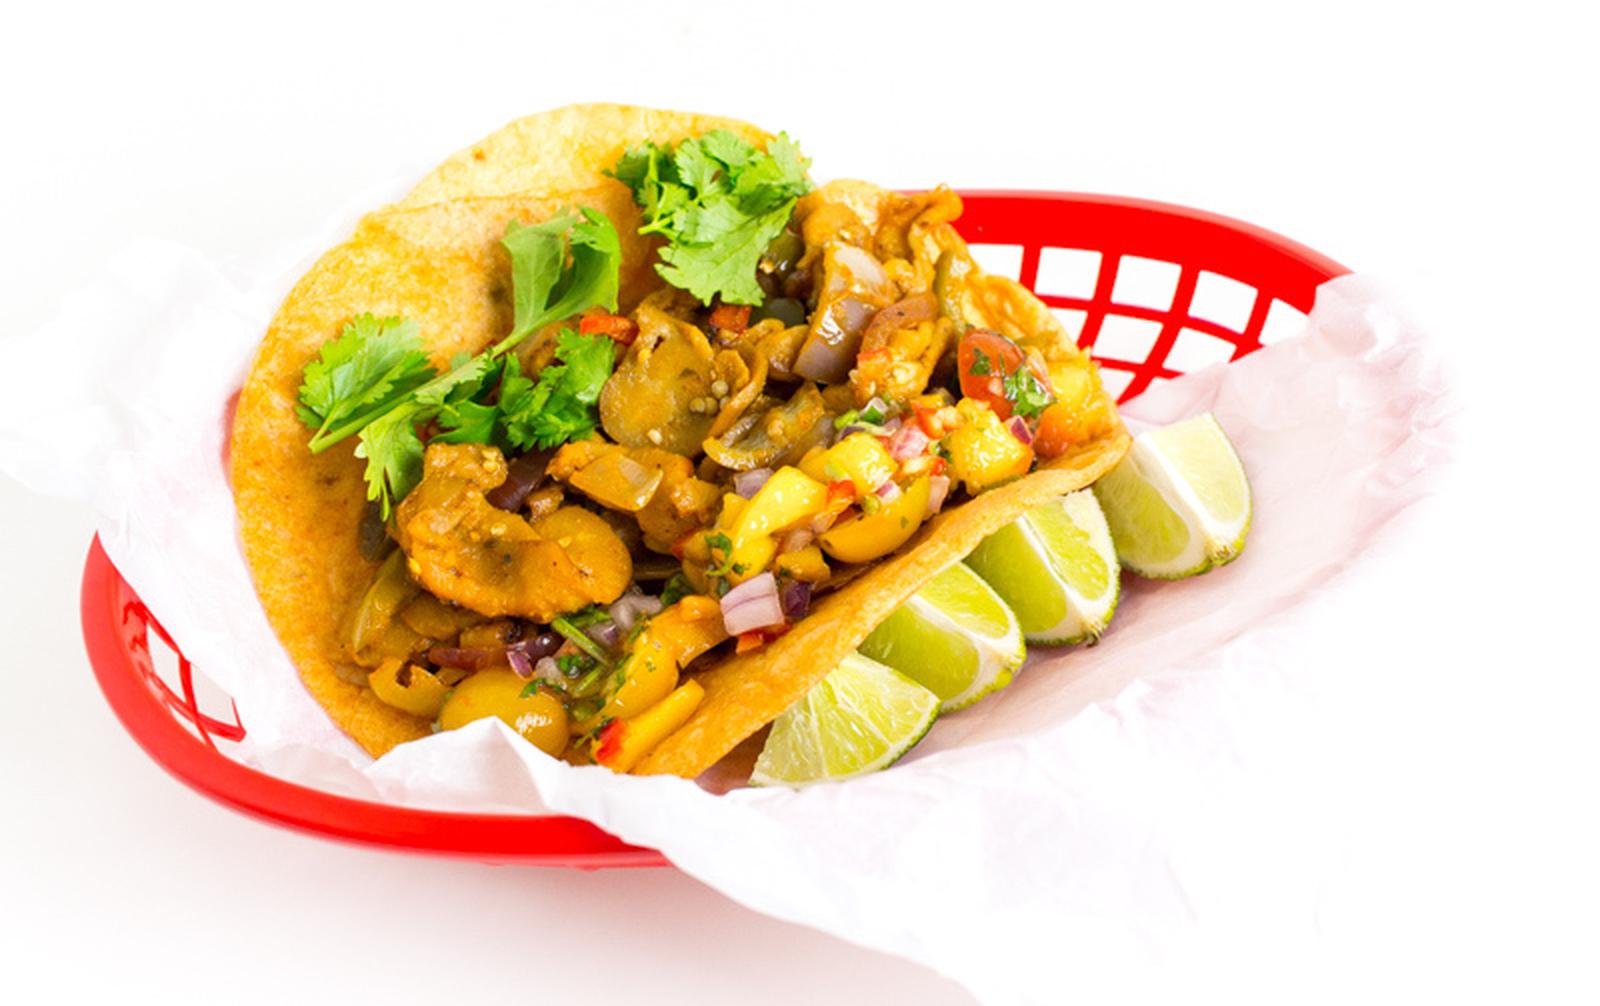 Eggplant Fajita Tacos [Vegan, Gluten-Free]